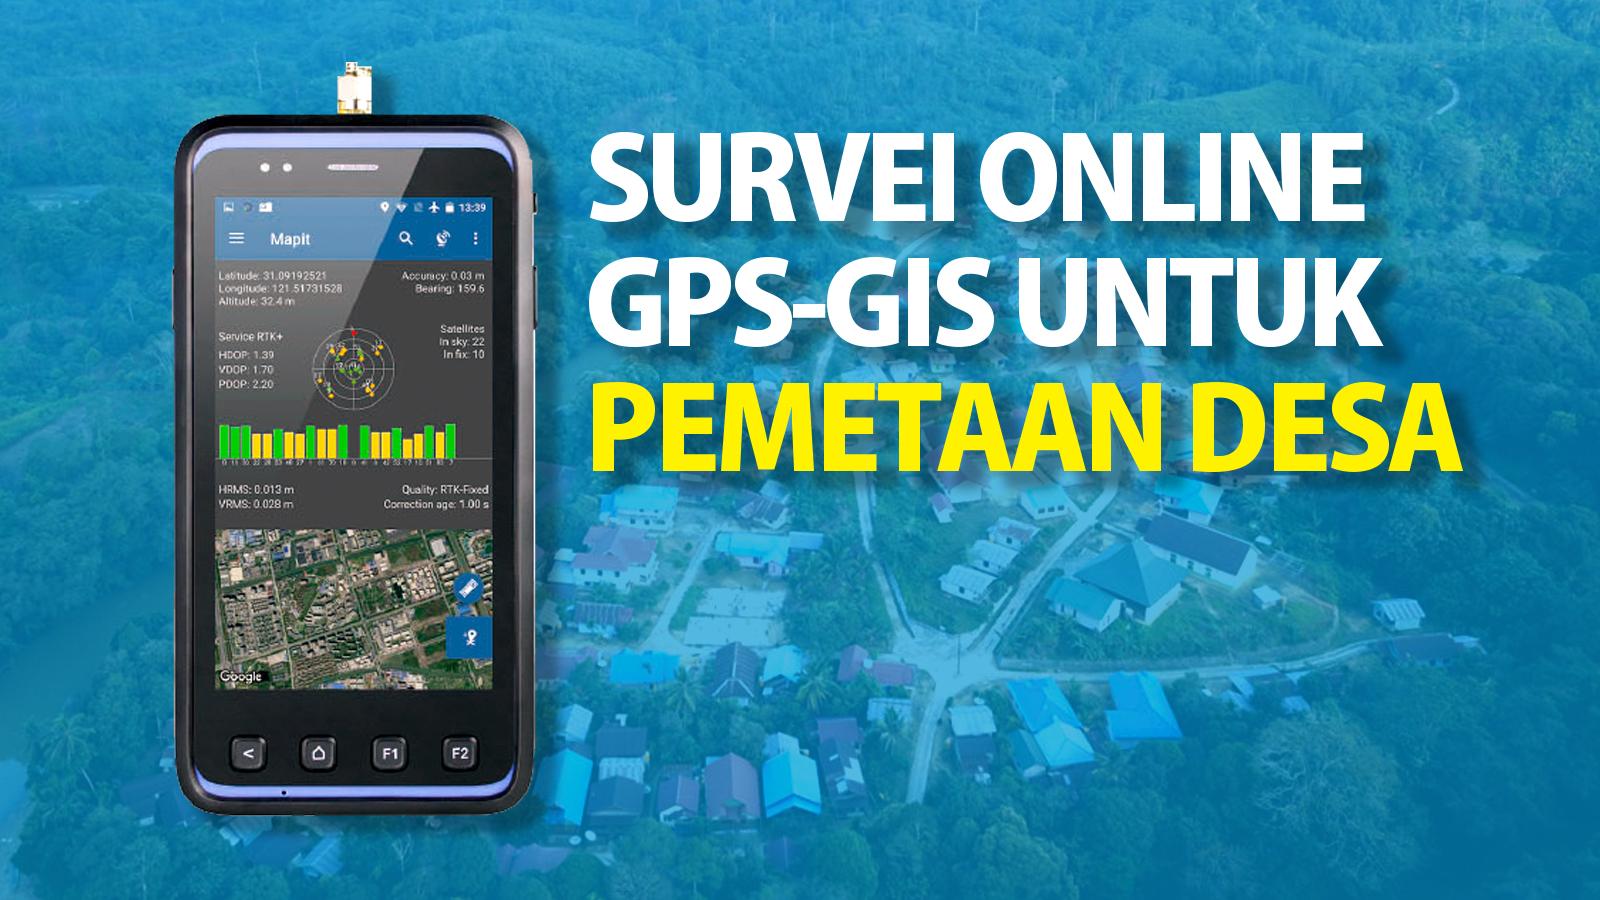 Survei Online GPS-GIS untuk Pemetaan Desa